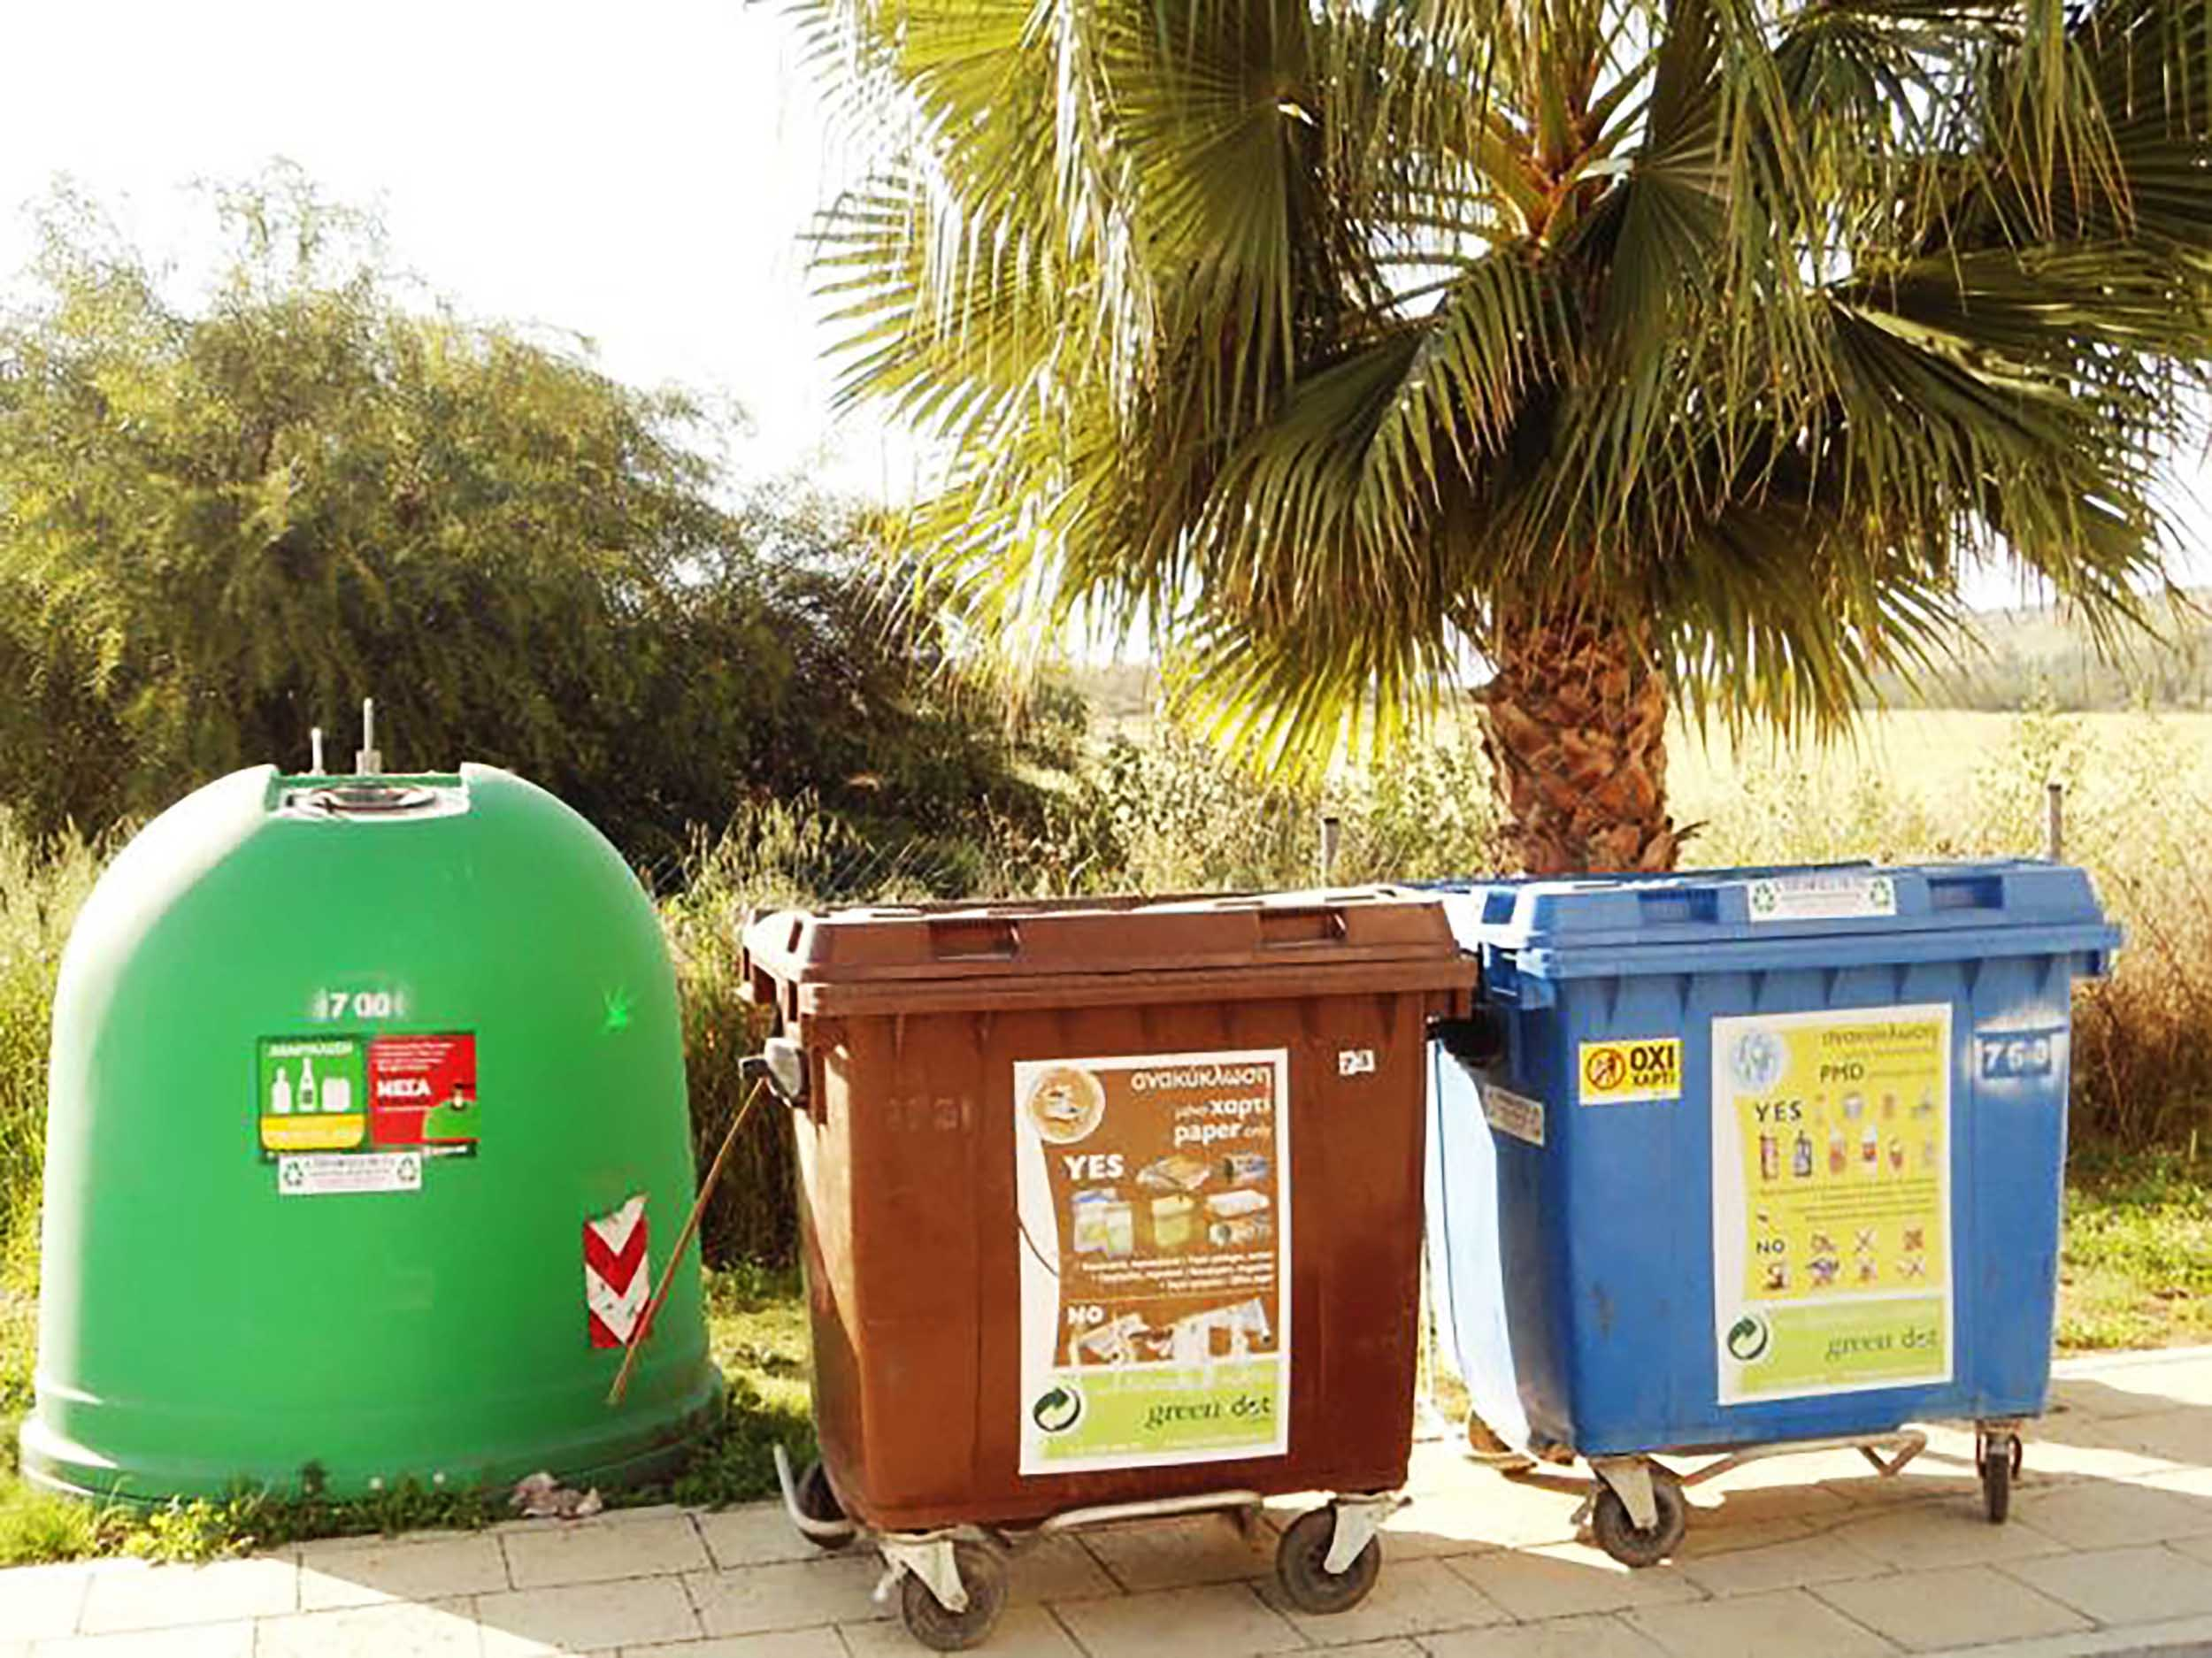 Financer bersih pantai akamas siprus 2019